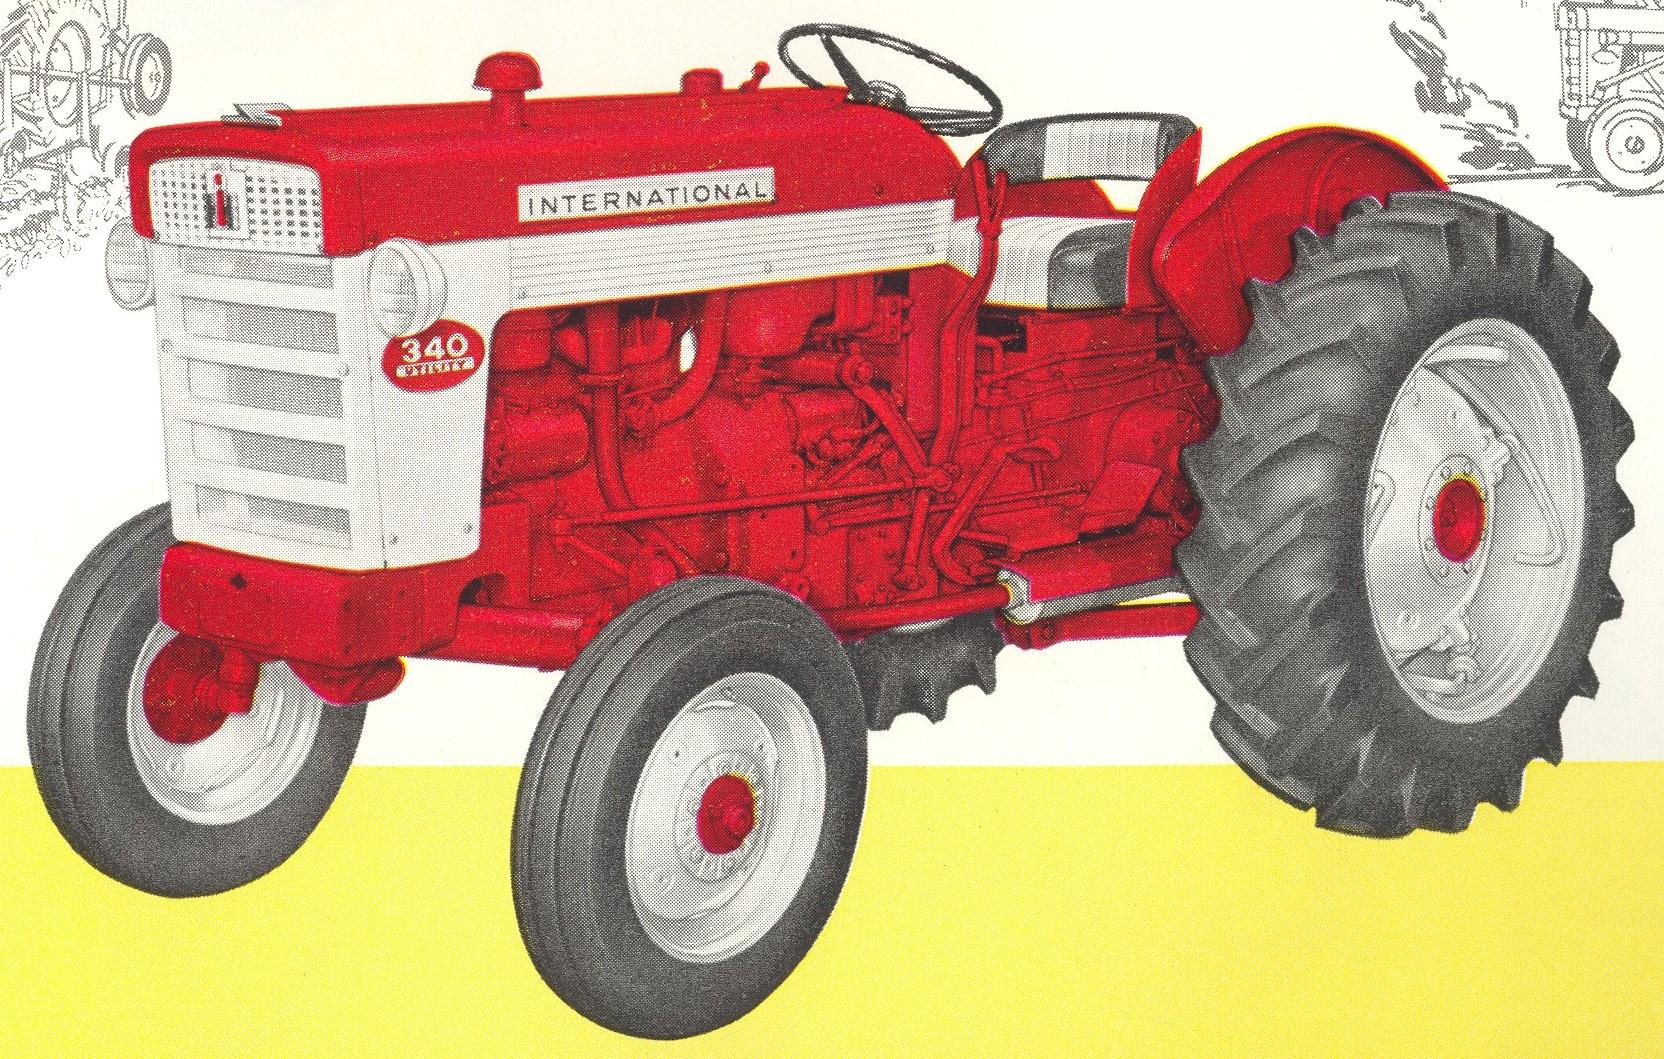 B250 Tractor Manual Farmall 340 Wiring Schematic International